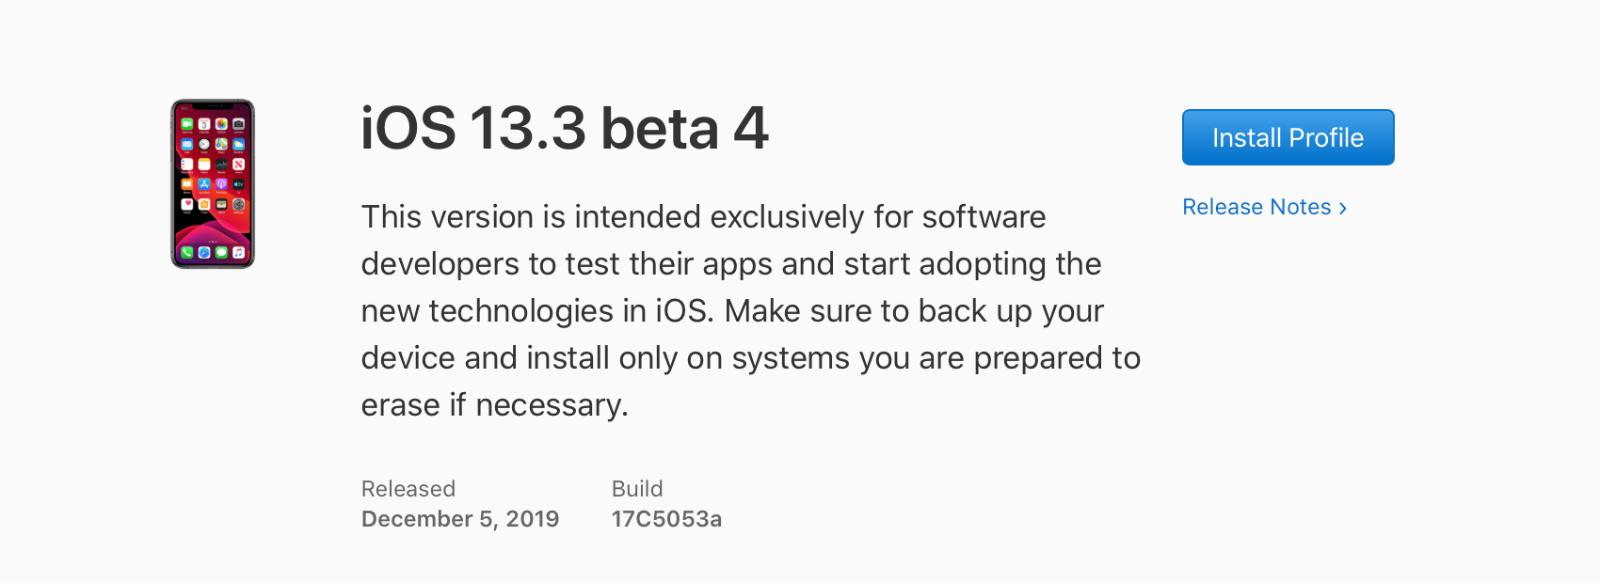 iOS 13.3 beta 4, iPadOS 13.3 beta 4, watchOS 6.1.1 beta 4 y tvOS 13.3 beta 4